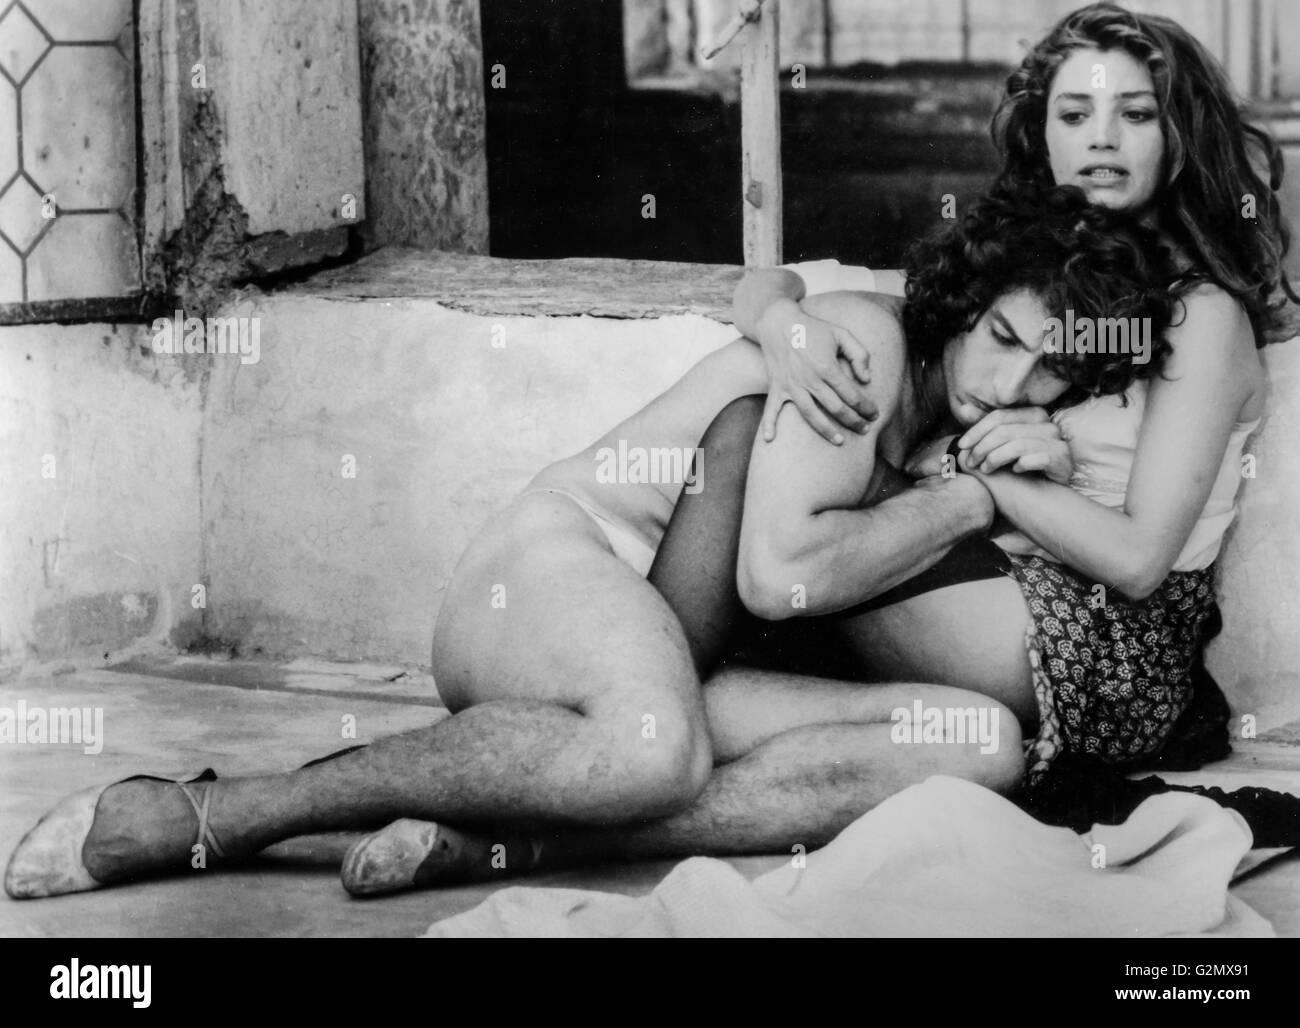 Daniel Ezralow,Angela Molina dans Camorra,1985 Photo Stock